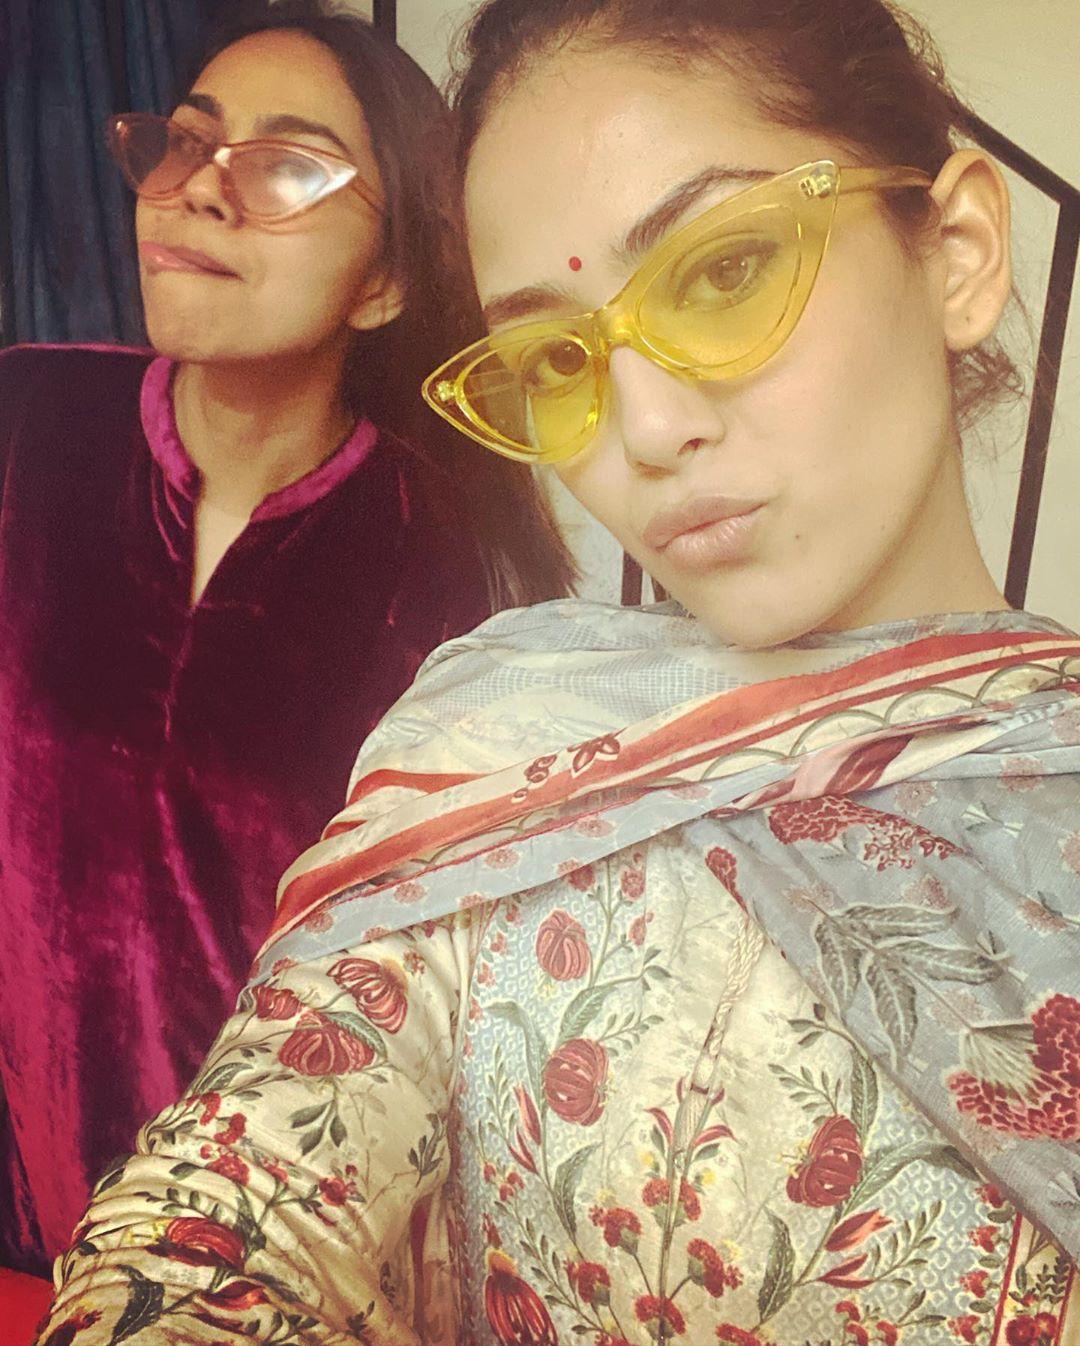 Mira Rajput Kapoor and Noor Wadhwani